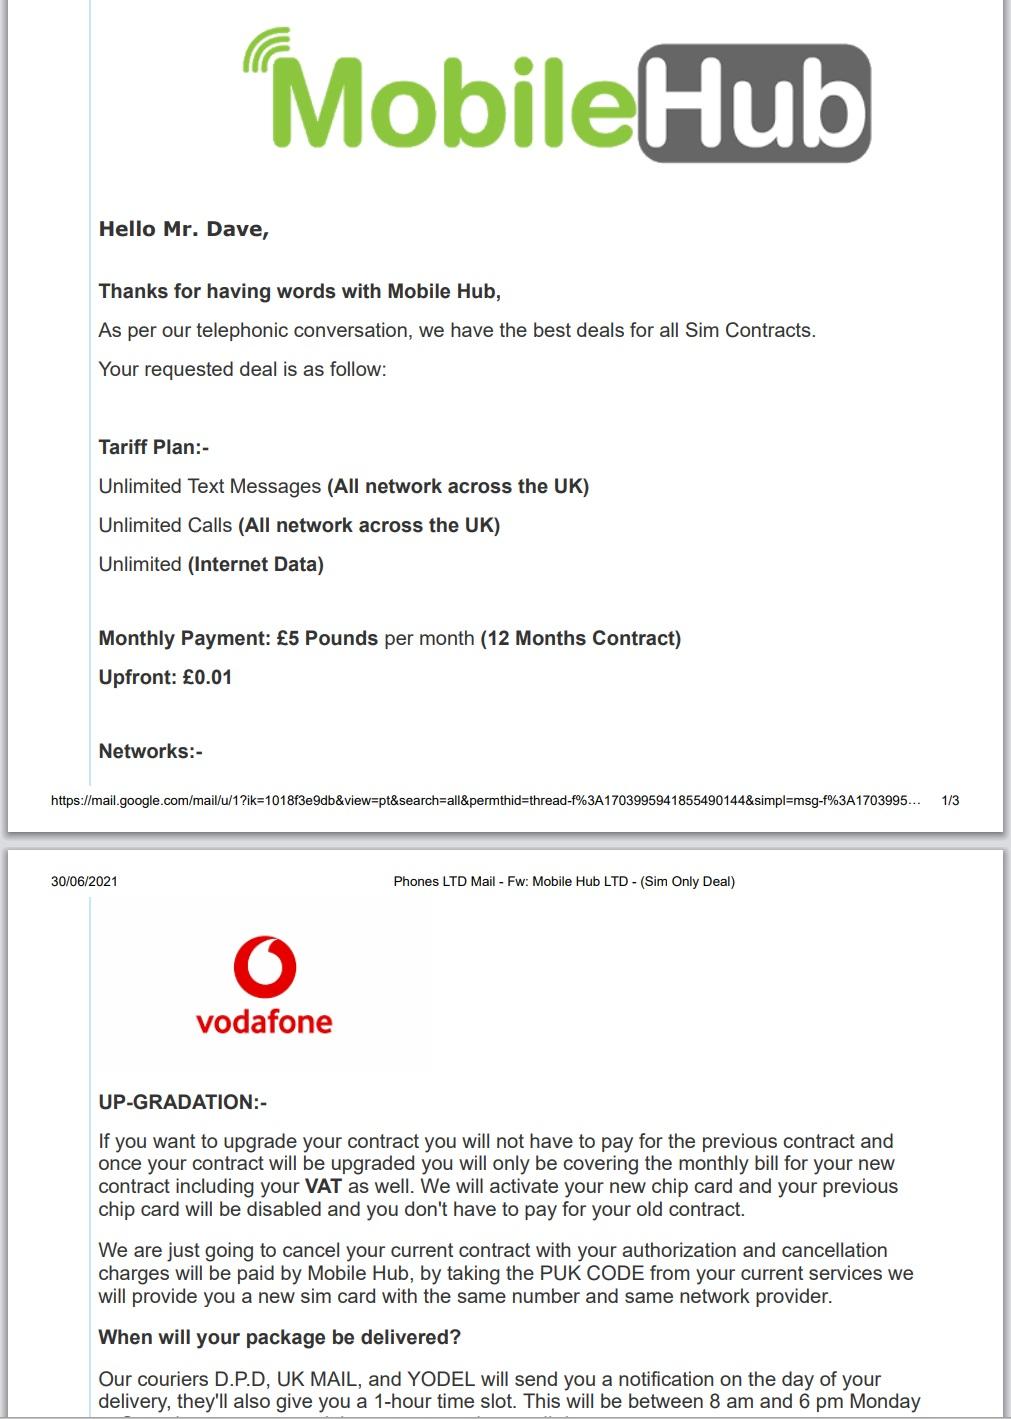 Mobile Scam - Mobile Hub LTD